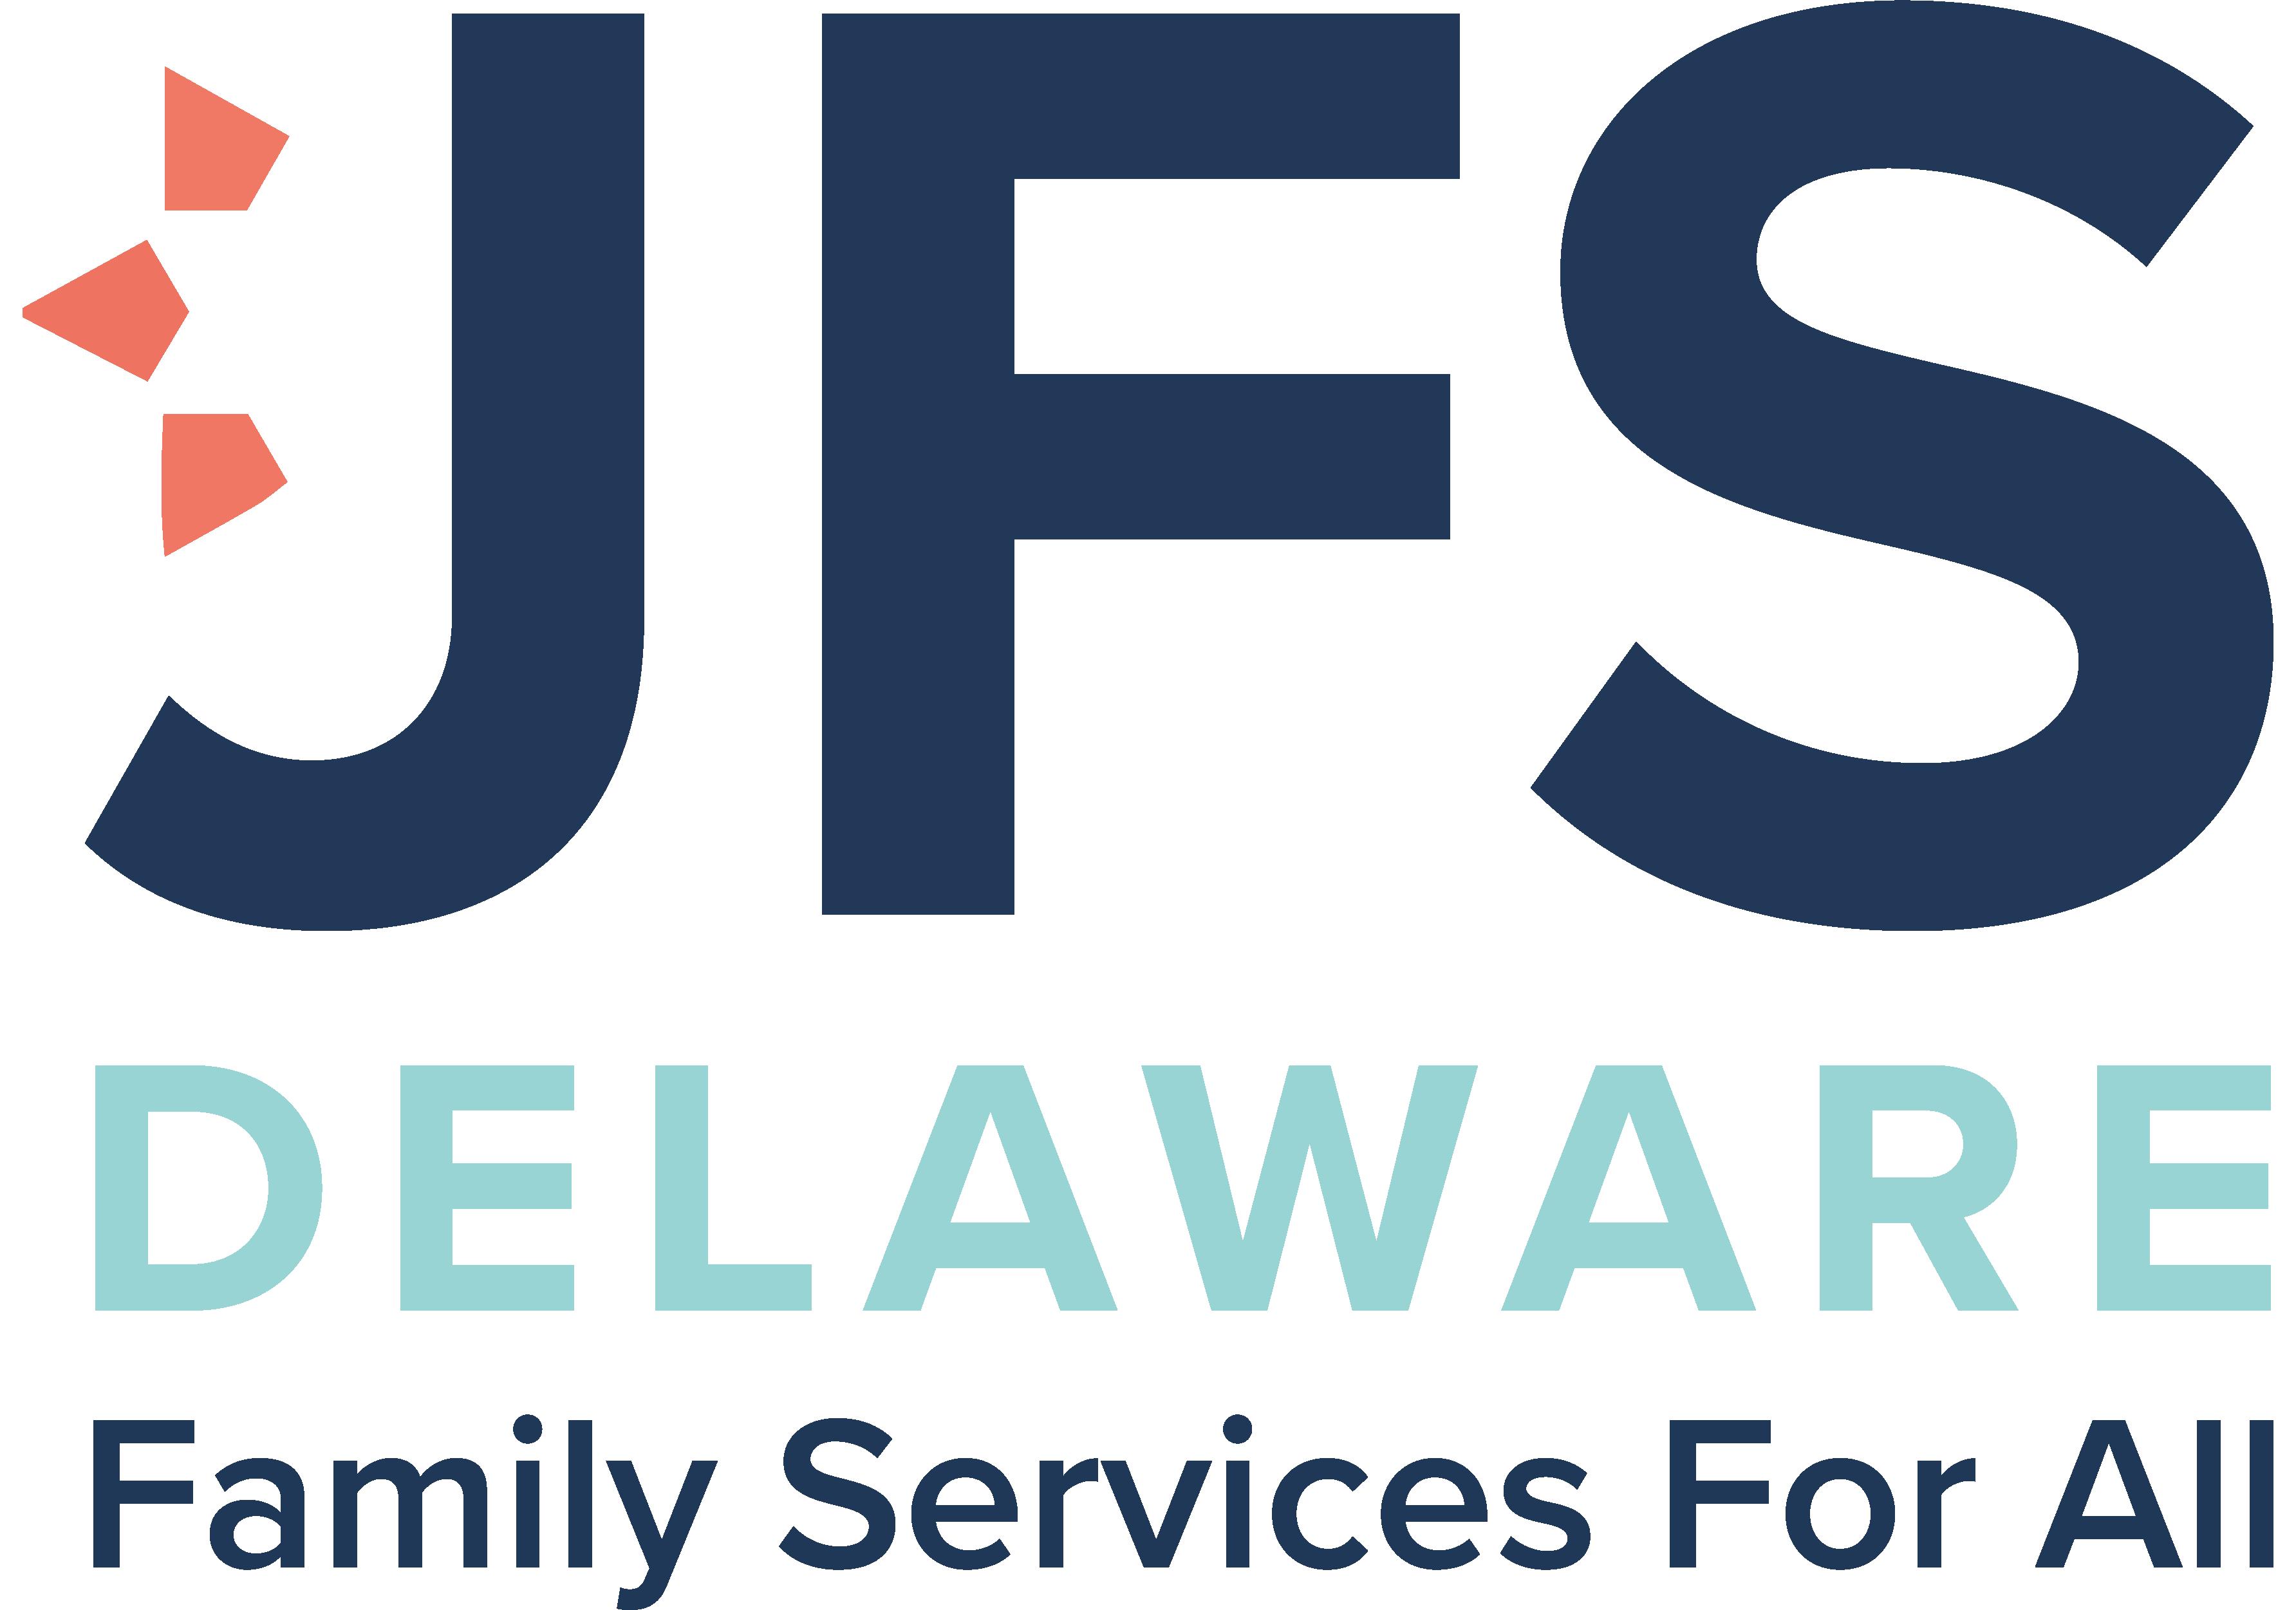 Jewish Family Services of Delaware, Inc. logo